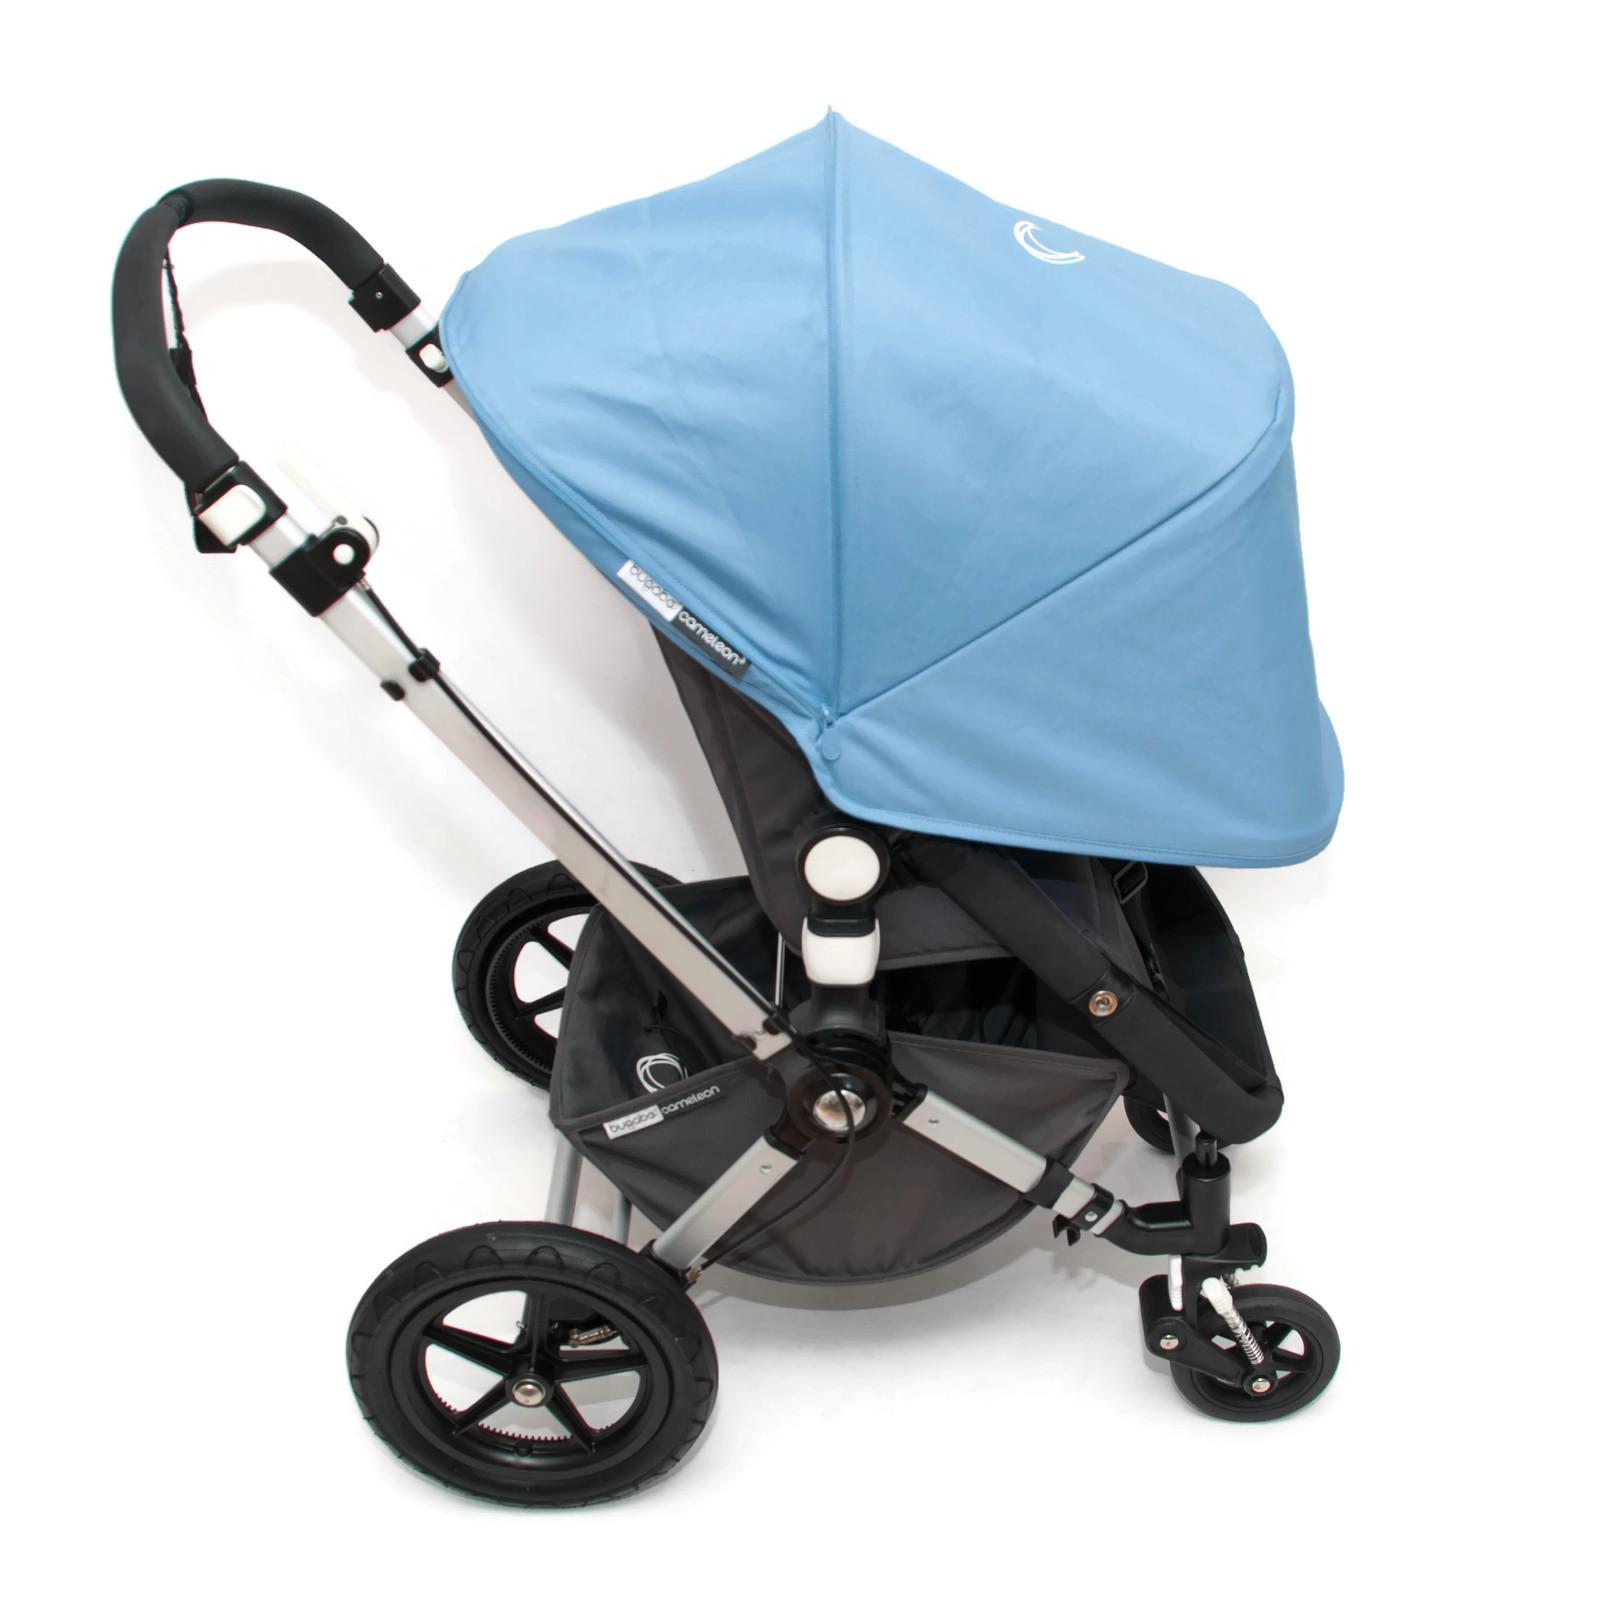 bugaboo cameleon 2 kinderwagen set komplett mit cam3 ice blue blau. Black Bedroom Furniture Sets. Home Design Ideas